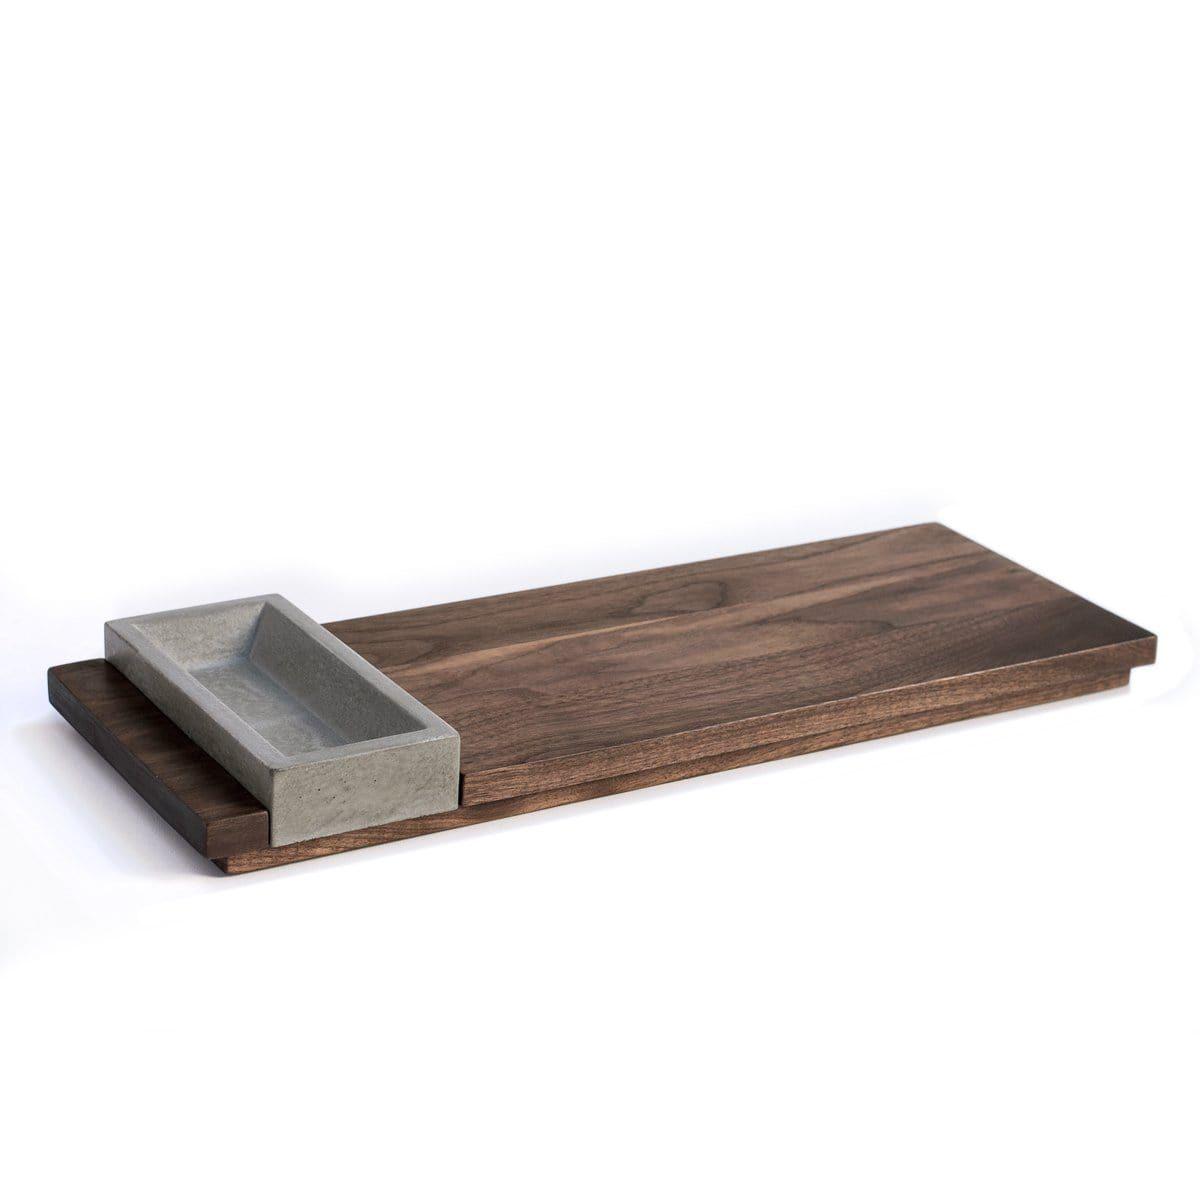 Concrete Bowl Wood Appetizer Tray In 2020 Concrete Bowl Serving Tray Wood Appetizer Trays